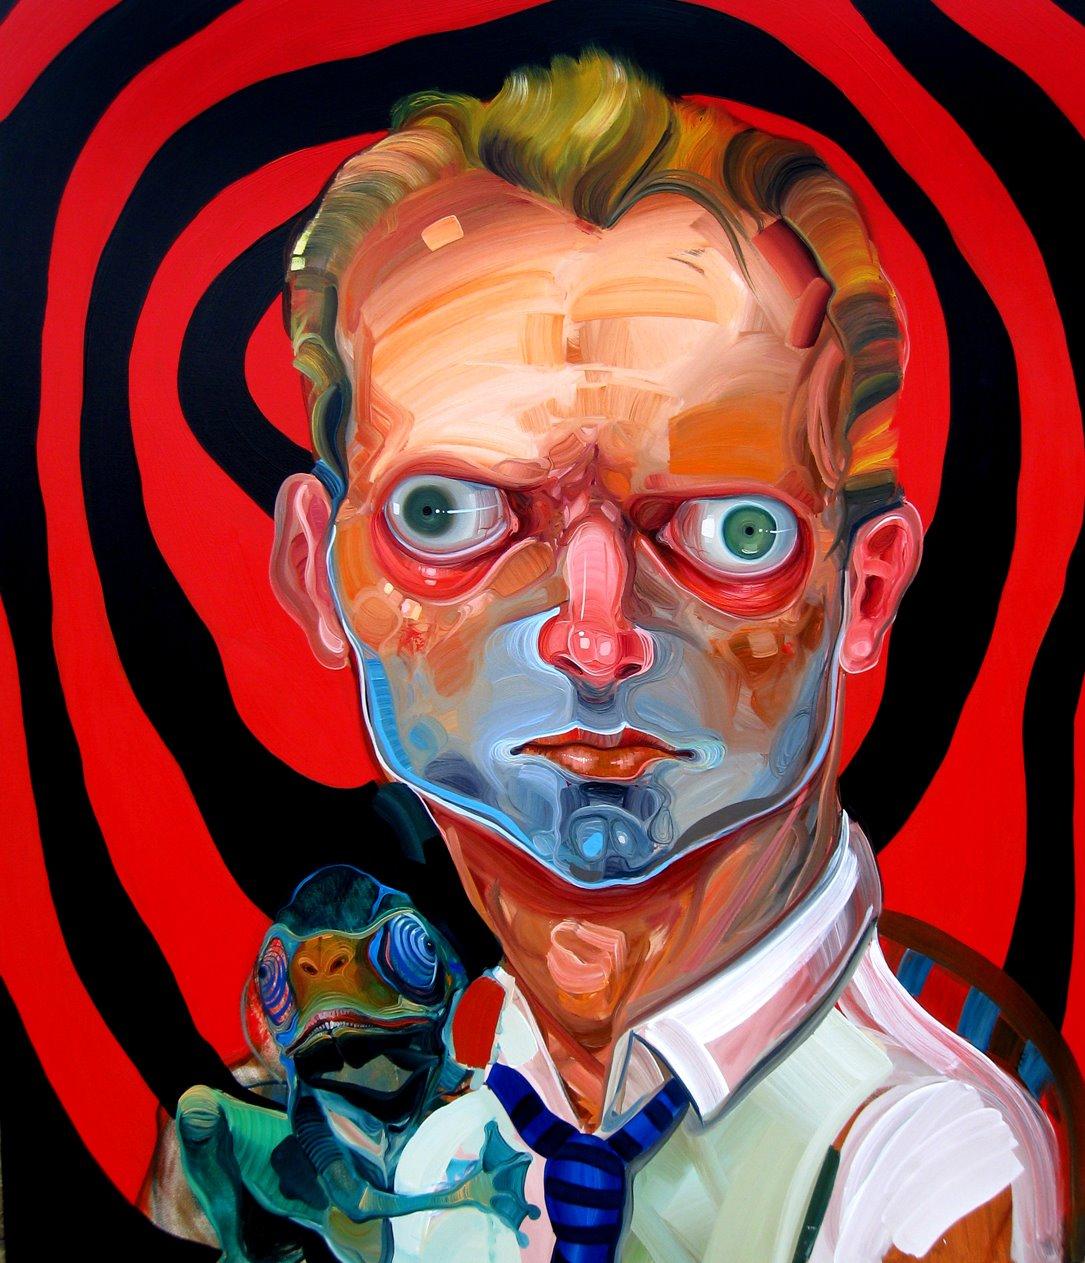 The Extraordinary and Eerie Art of Jose Luis Carranza